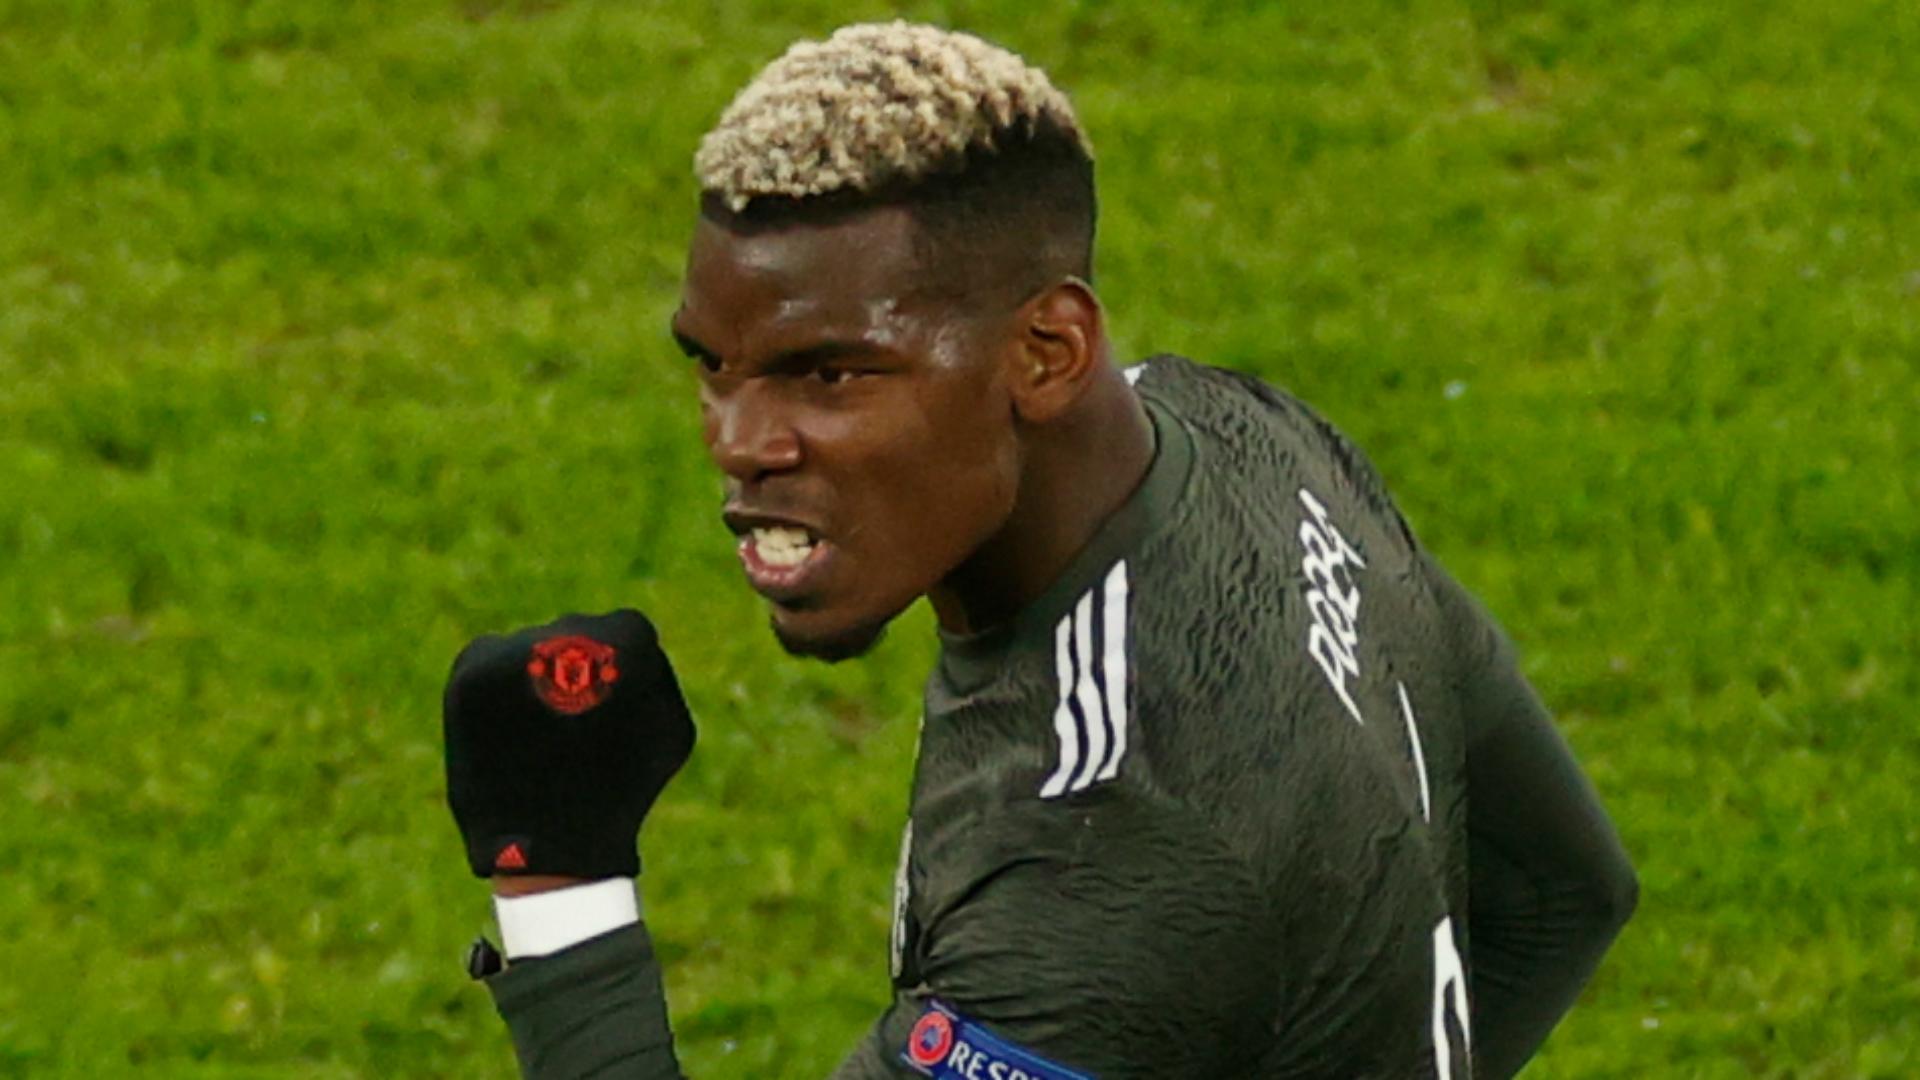 'He's got the hunger' - Solskjaer credits Pogba desire after Raiola pleads for Man Utd transfer